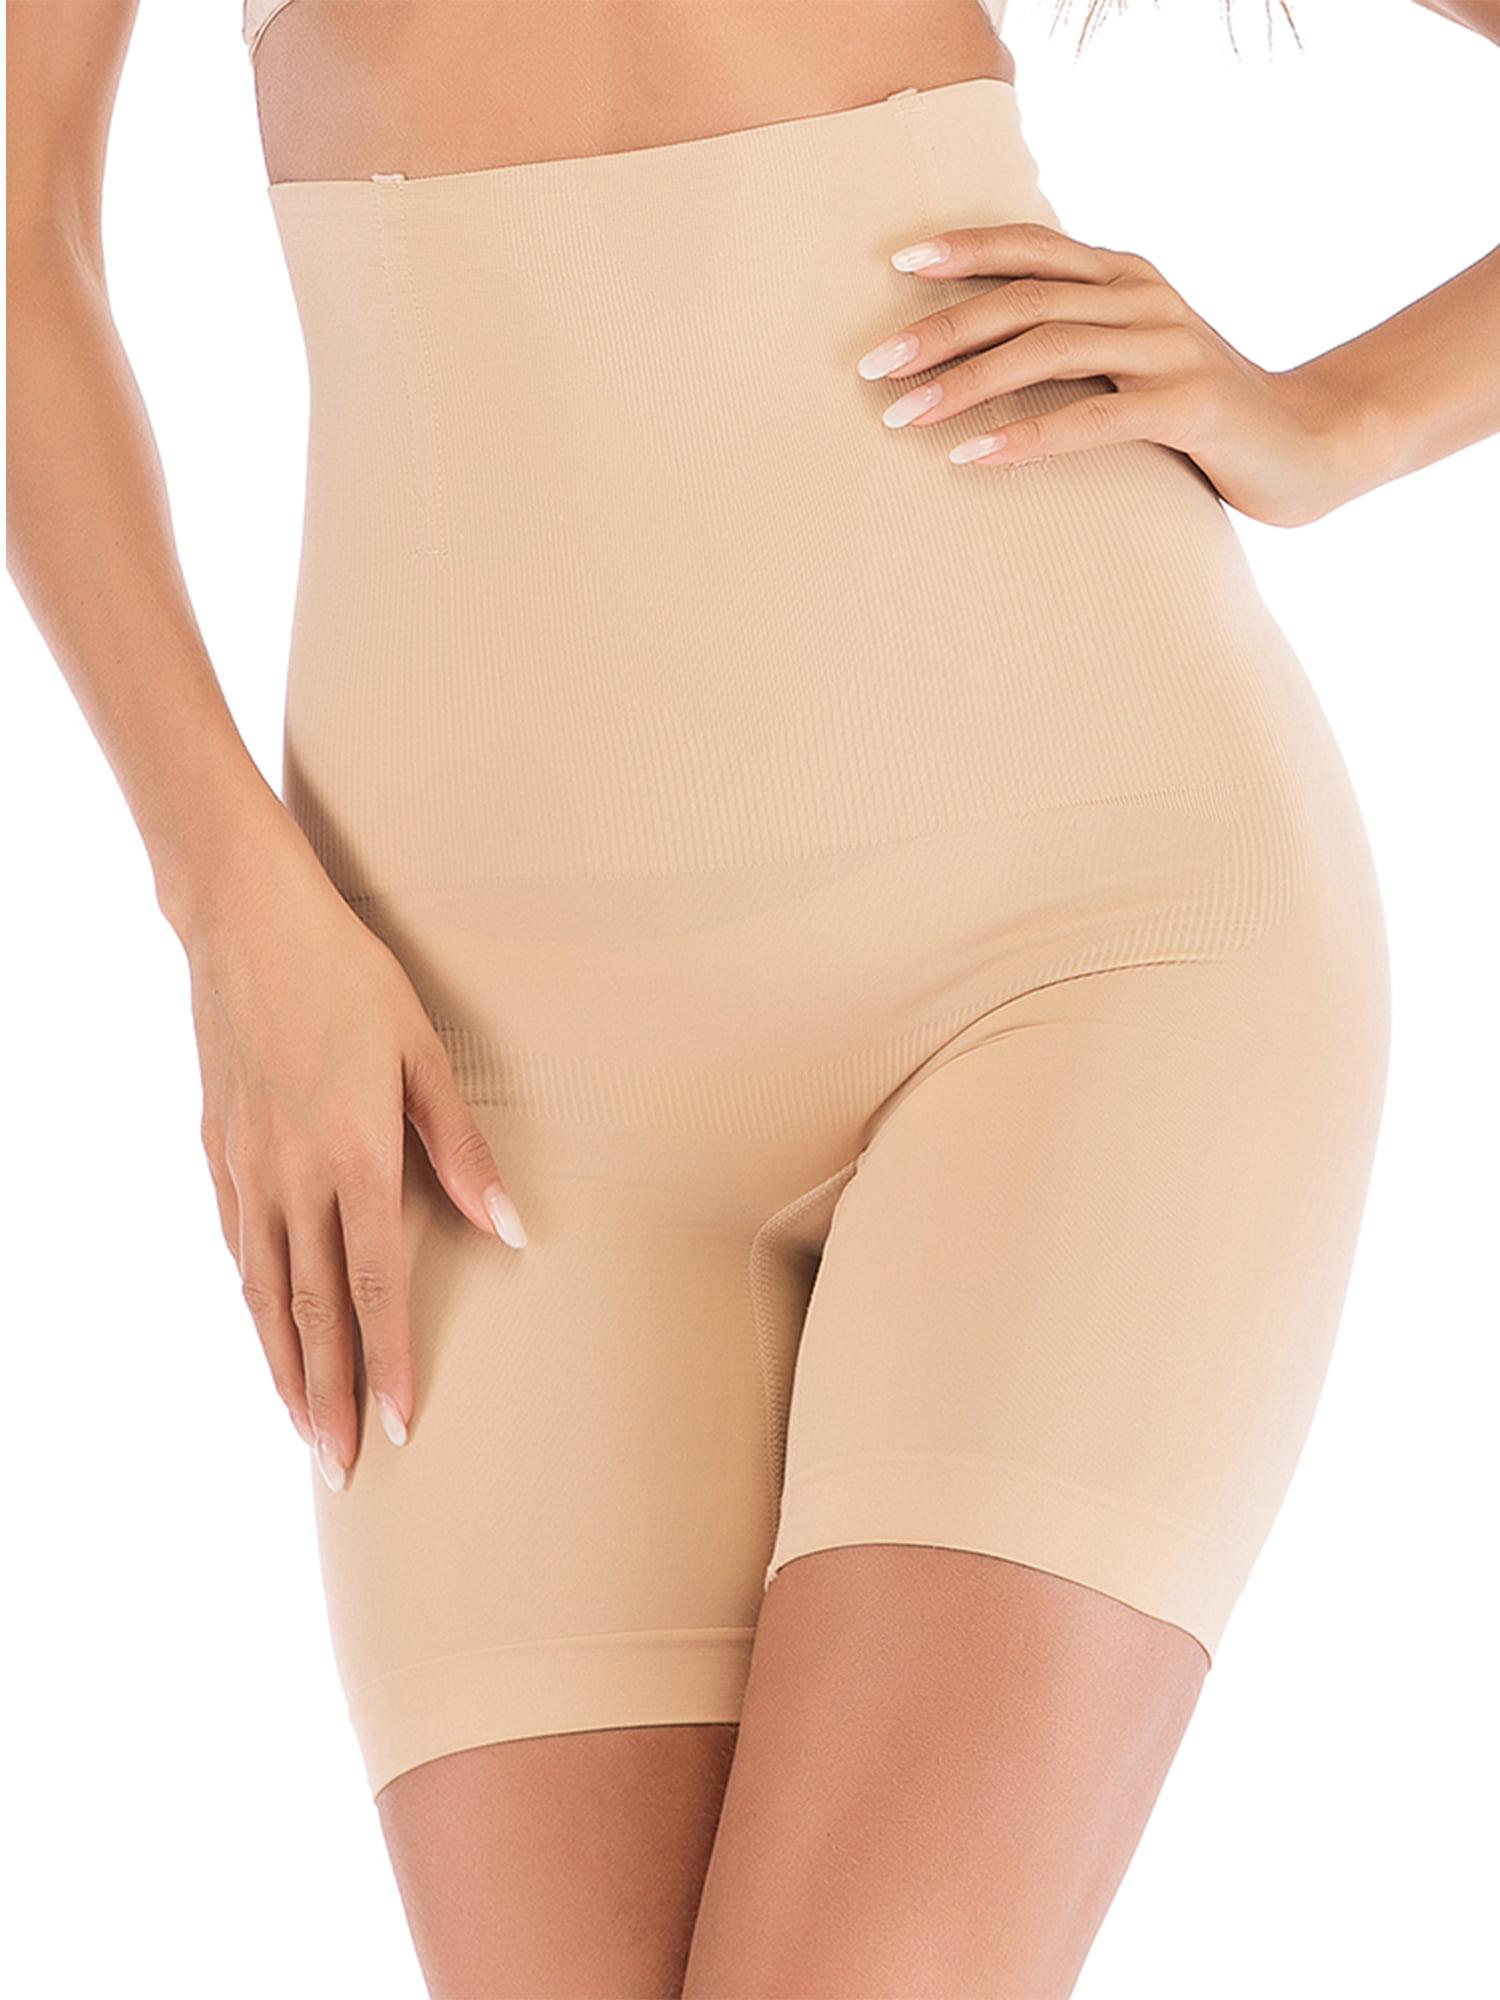 bd16c30c6f7e SAYFUT - SAYFUT Seamless Tummy Control Shapewear Shorts for Women High  Waist Shaping Thigh Slimmer Panties Underwear - Walmart.com